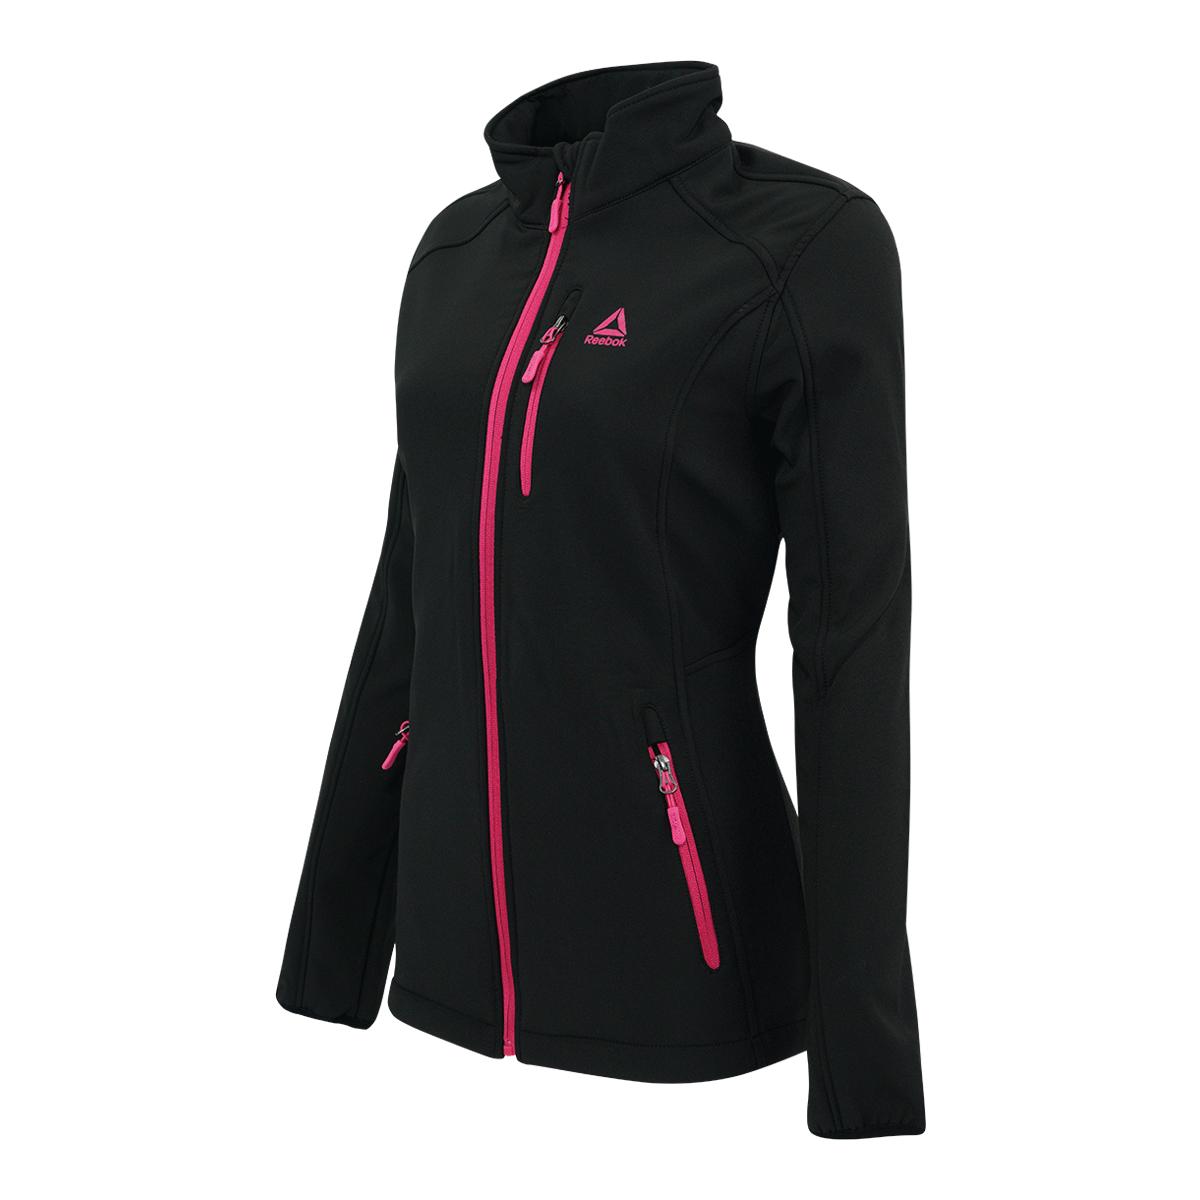 Reebok-Women-039-s-Full-Zip-Softshell-Jacket thumbnail 11